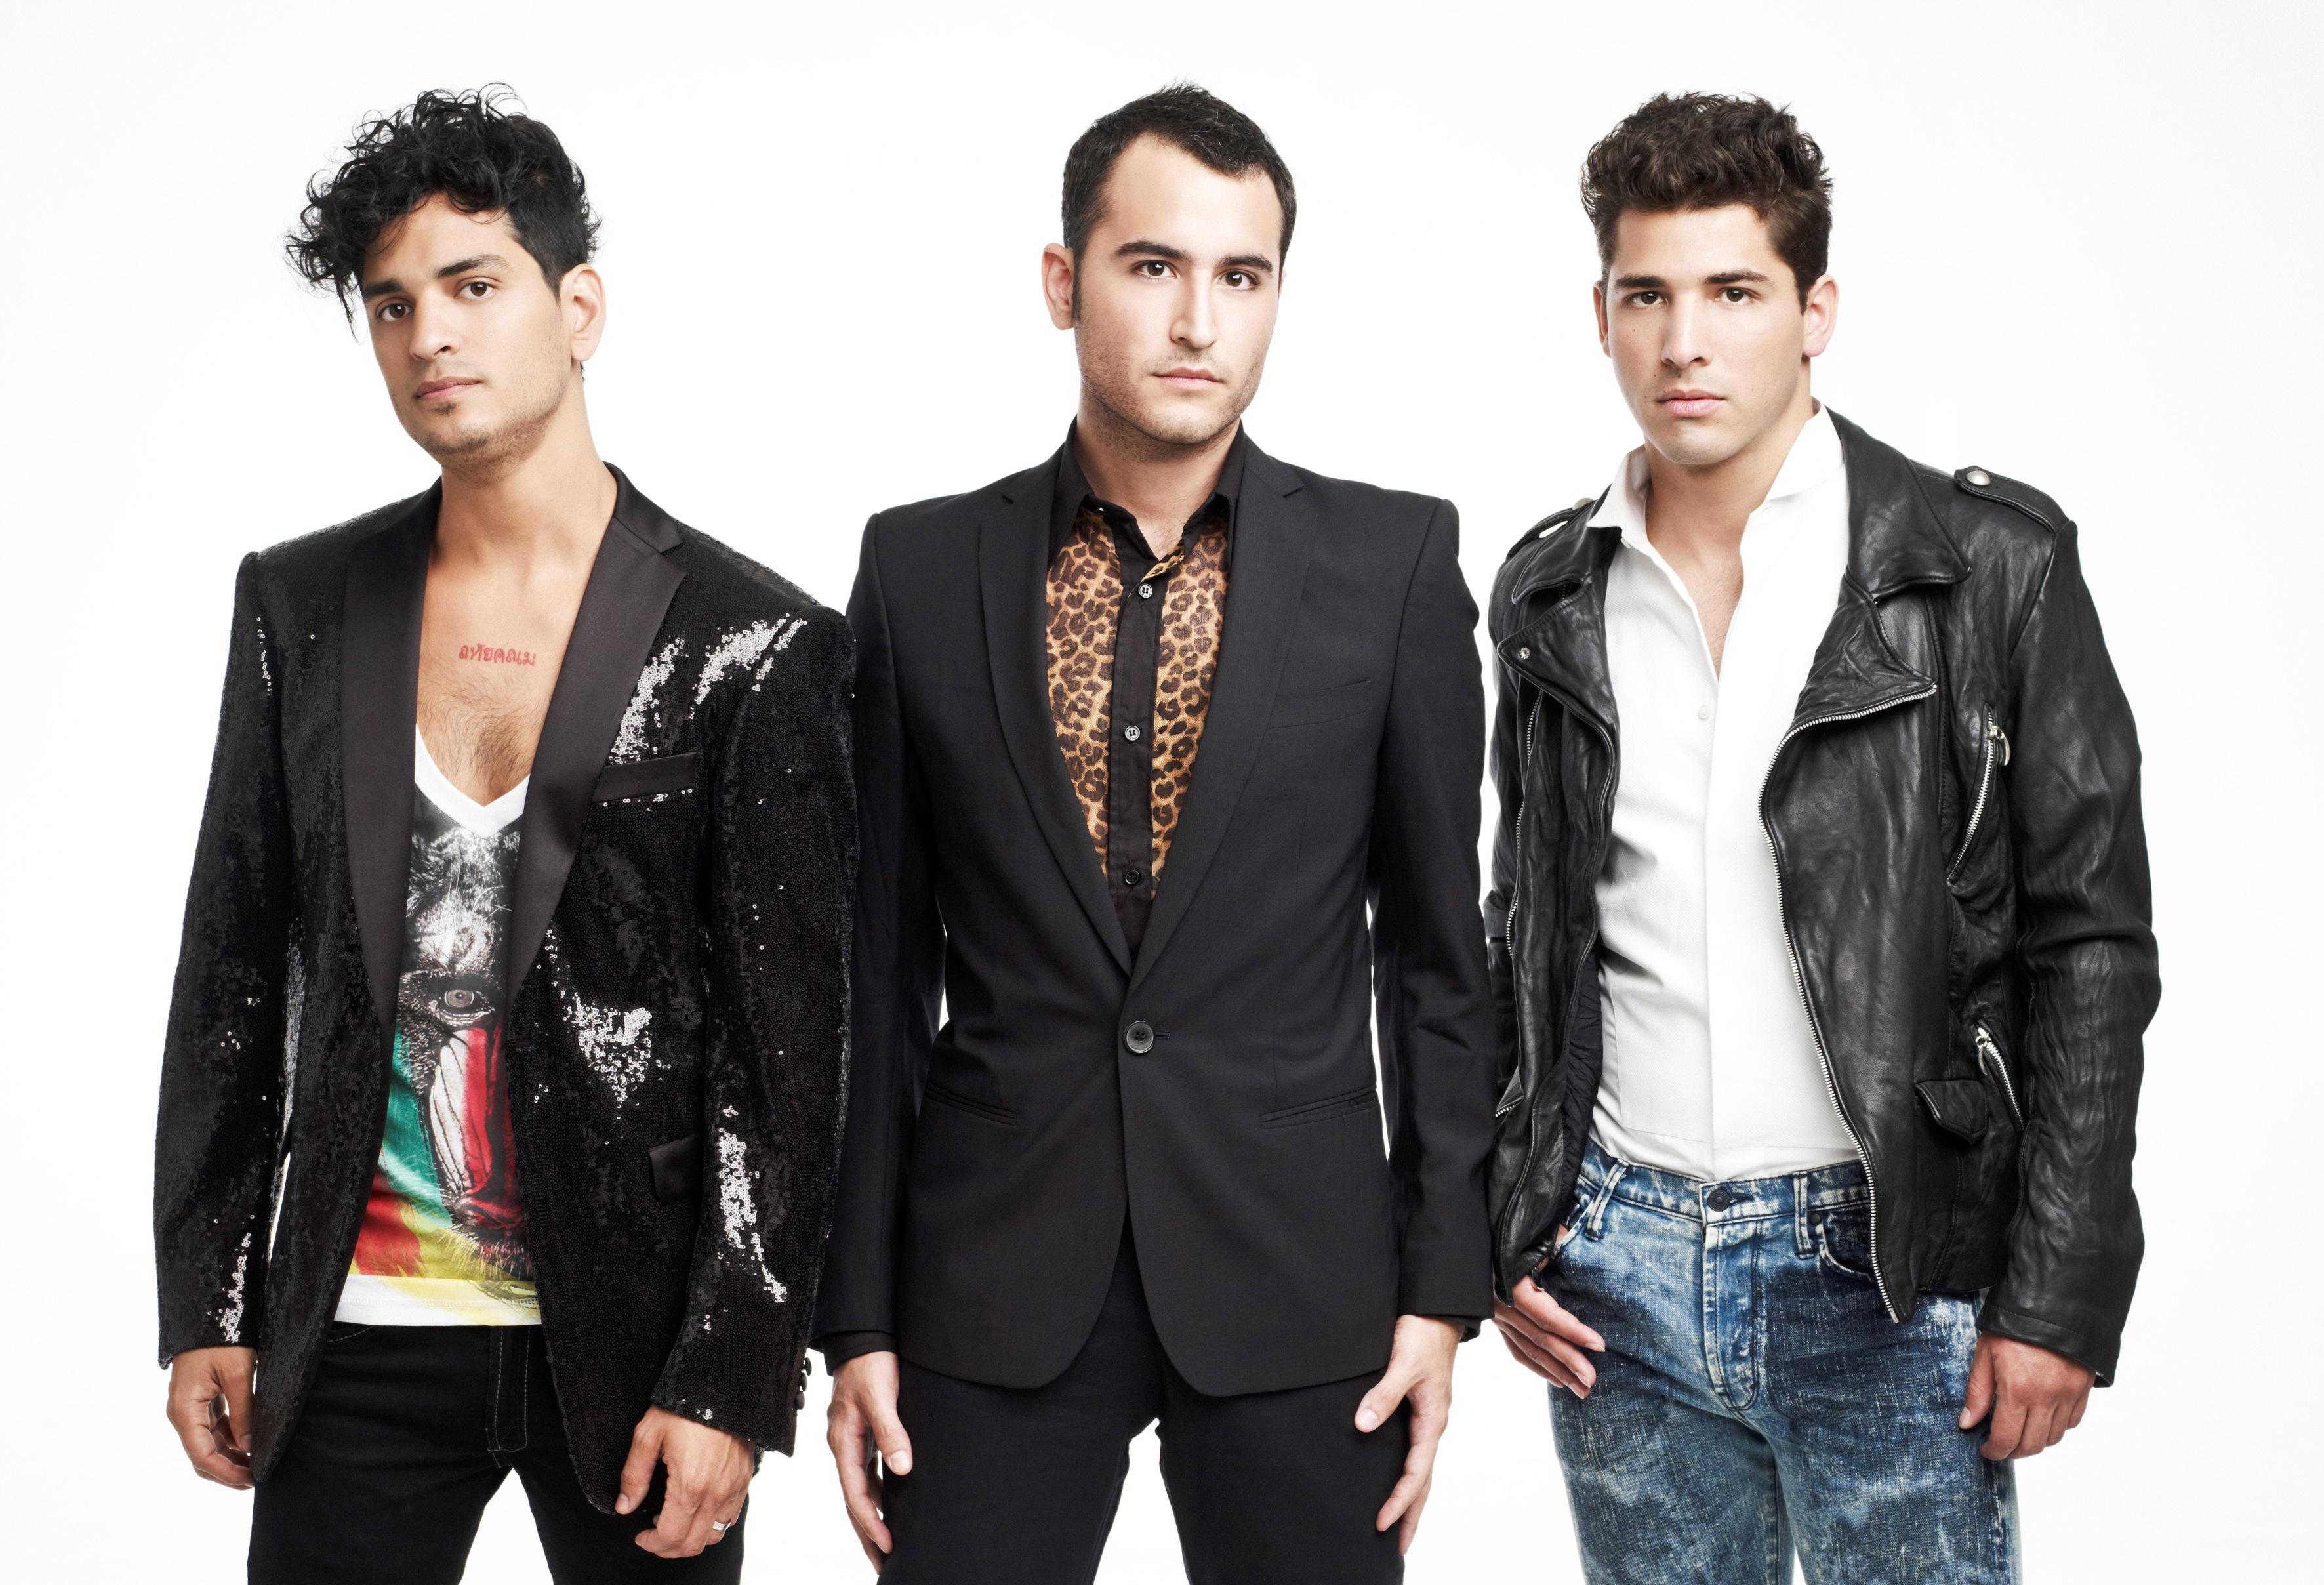 grupo pop mexicano: